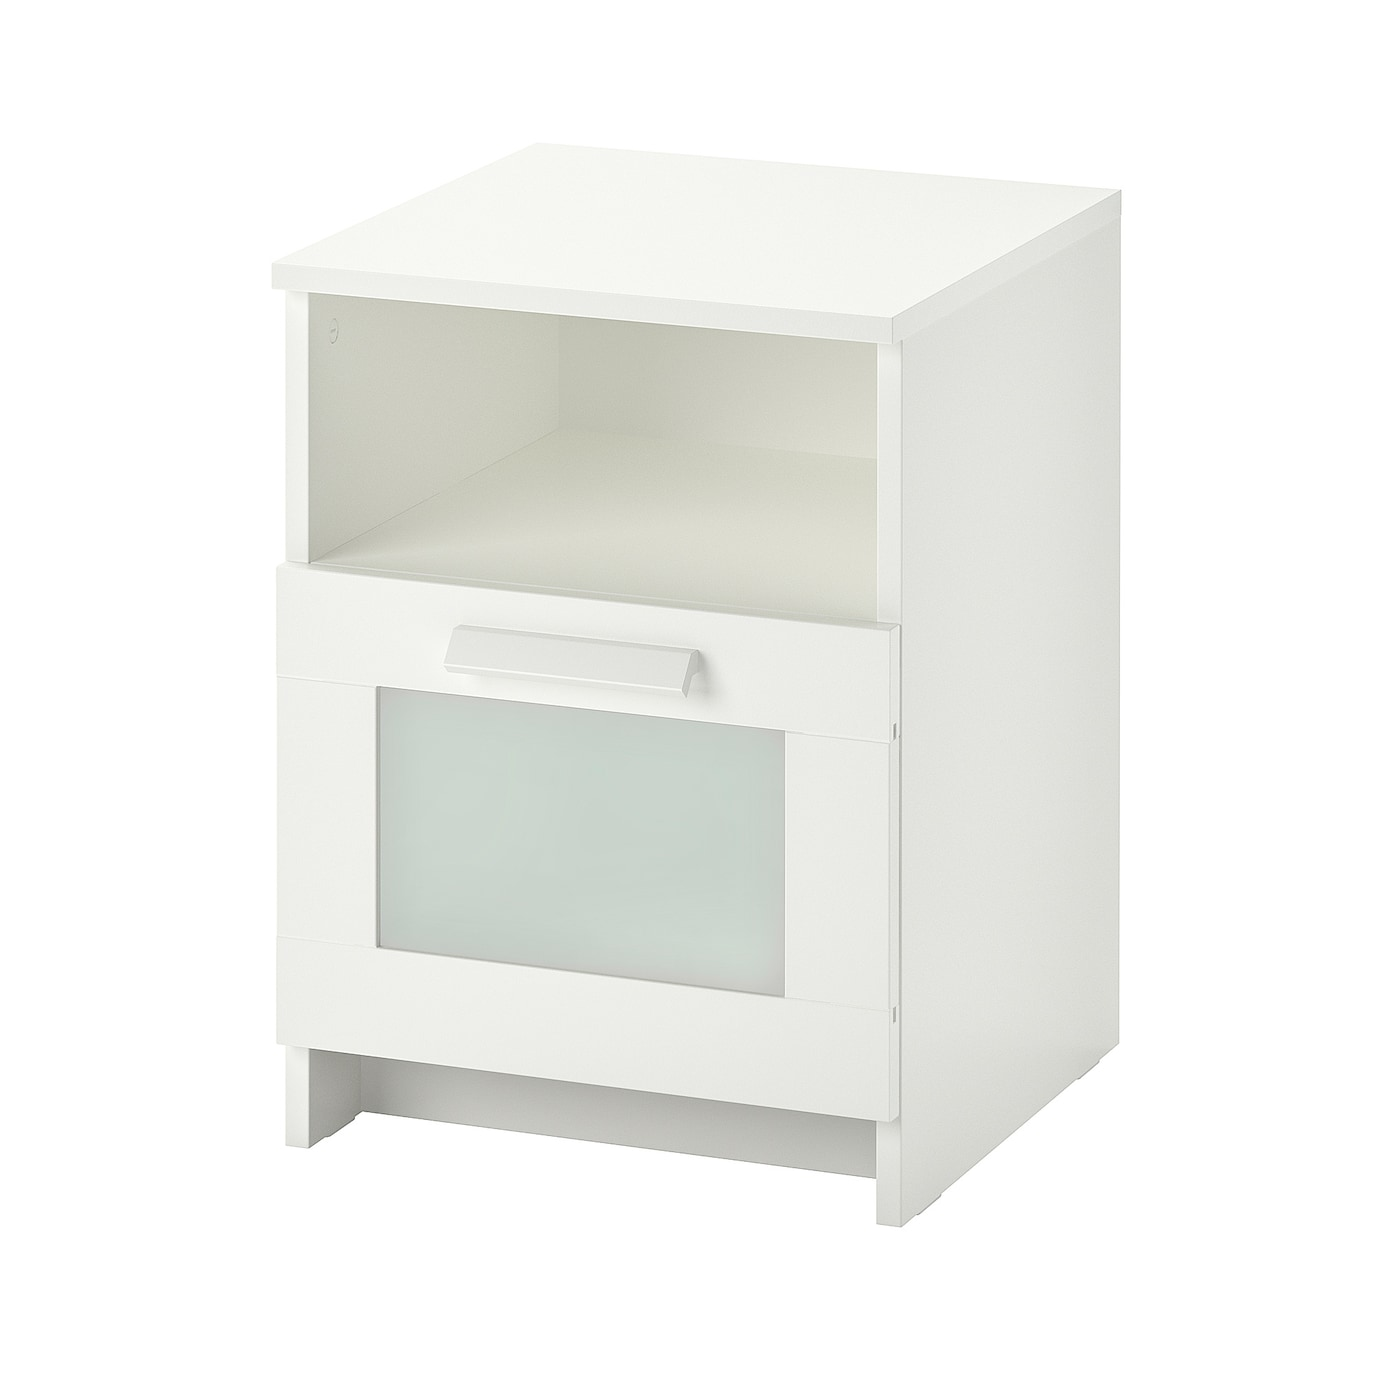 Brimnes Nightstand White 15 3 8x16 1 8 Ikea